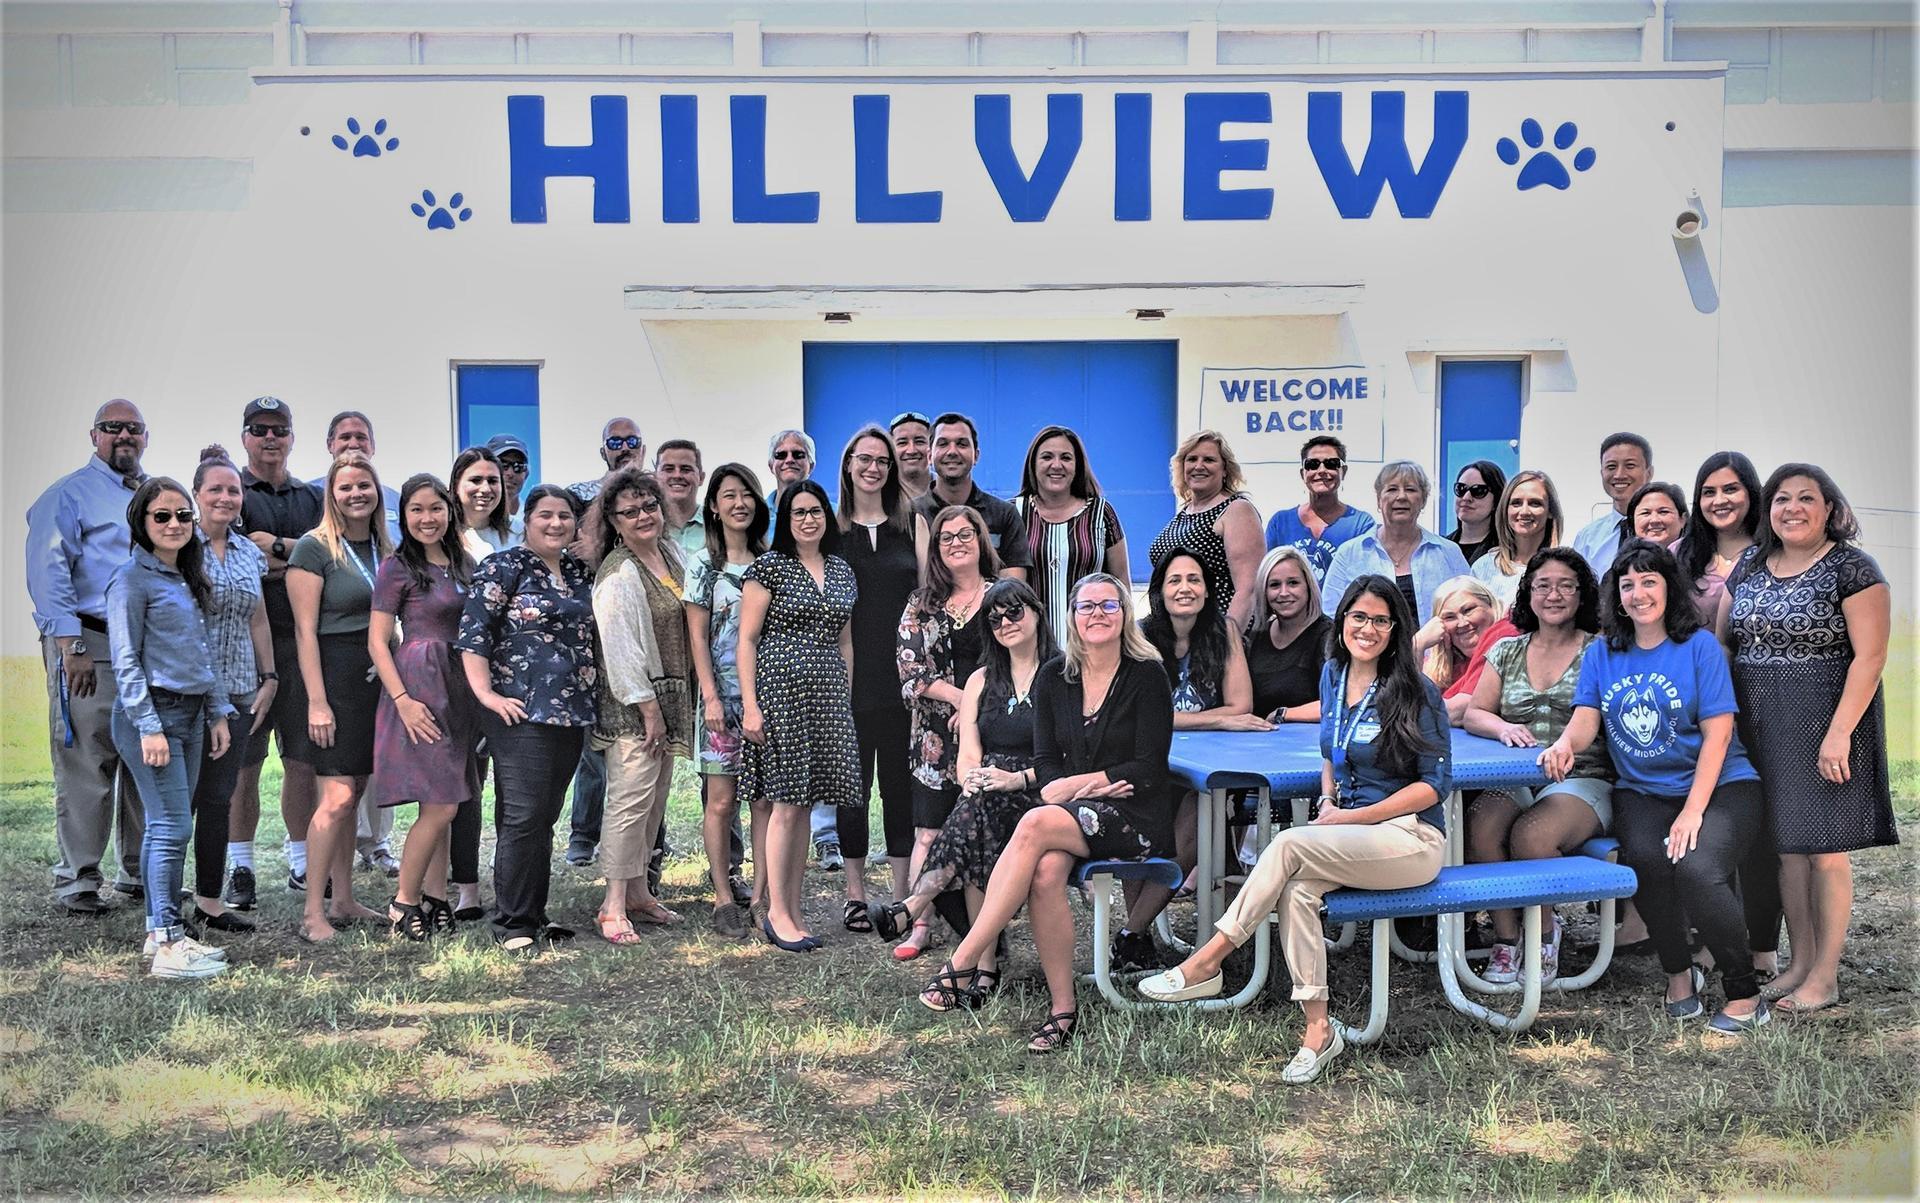 Hillview Staff